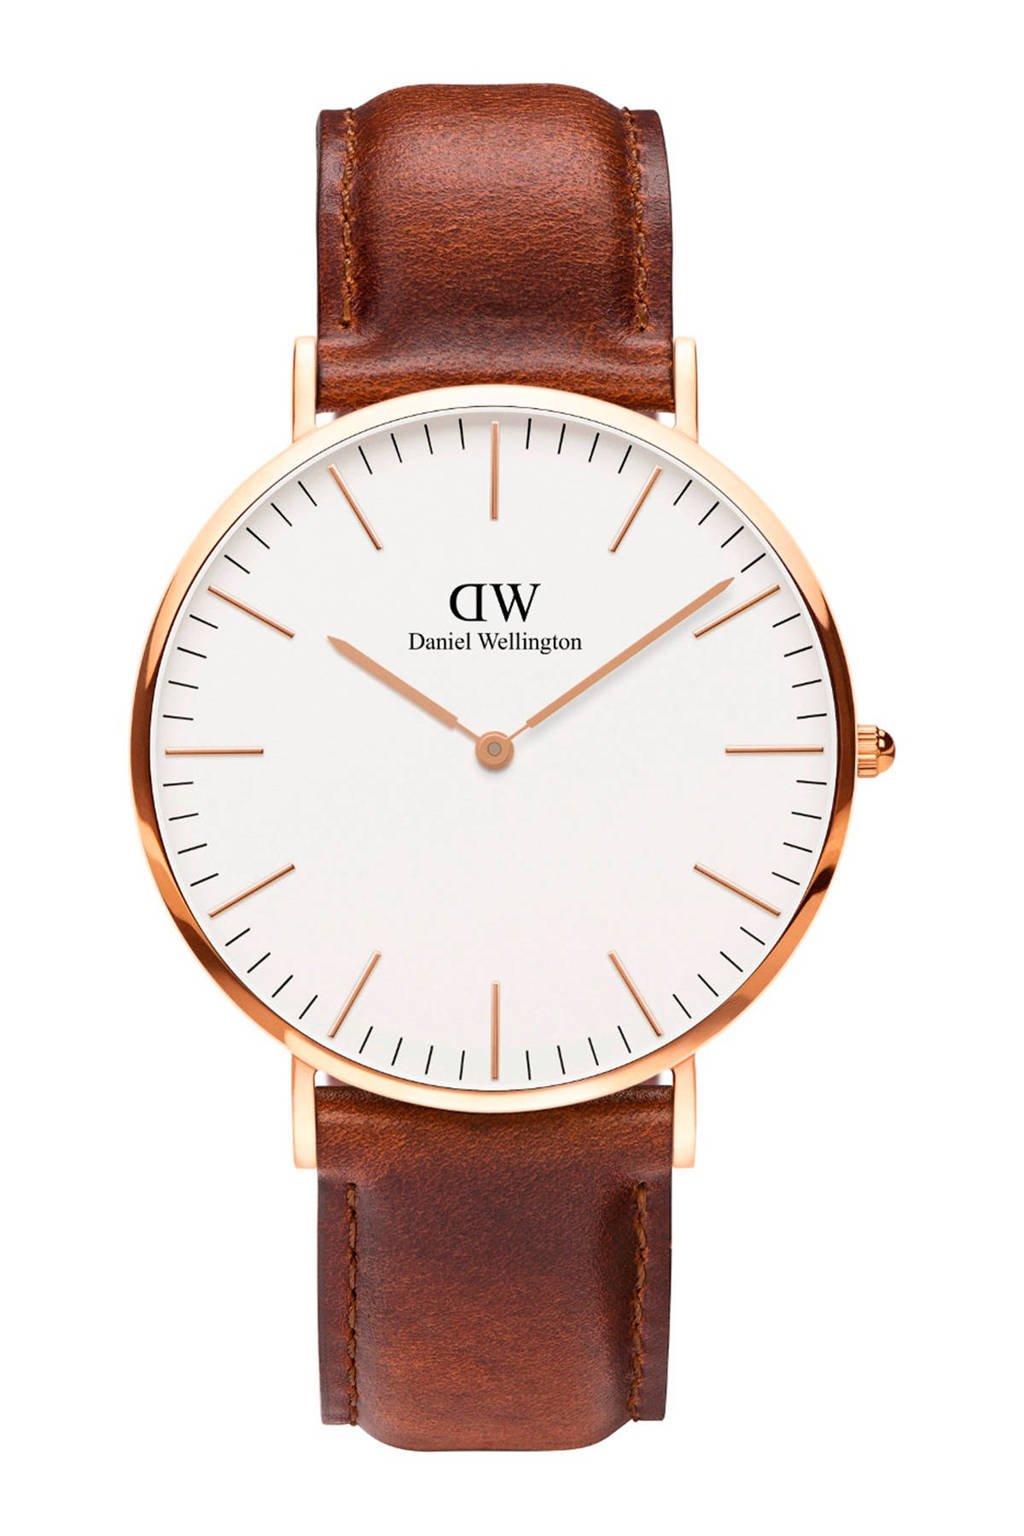 Daniel Wellington horloge DW00100006, Bruin